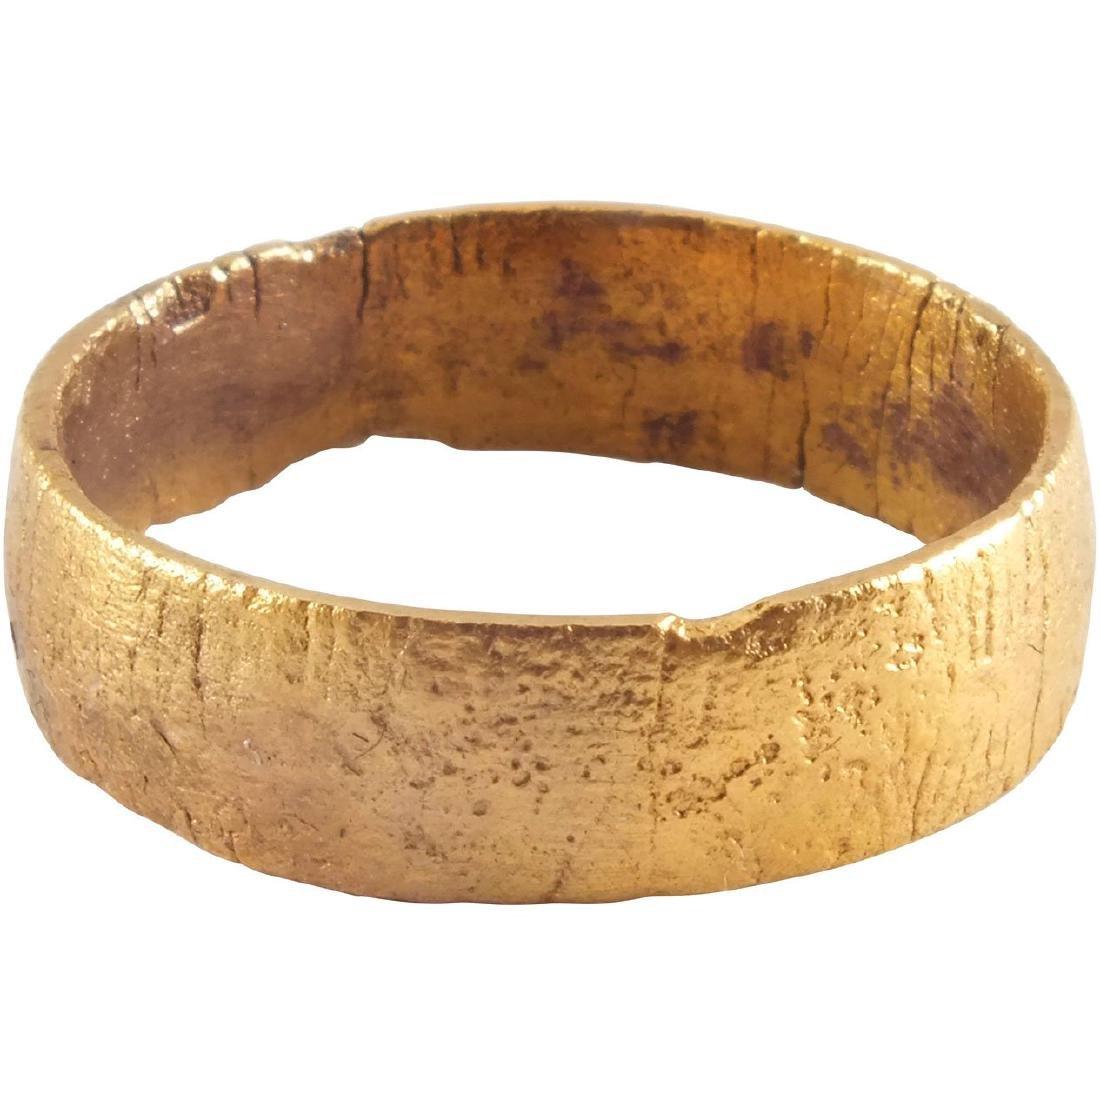 ANCIENT VIKING PINKY RING C.900 AD